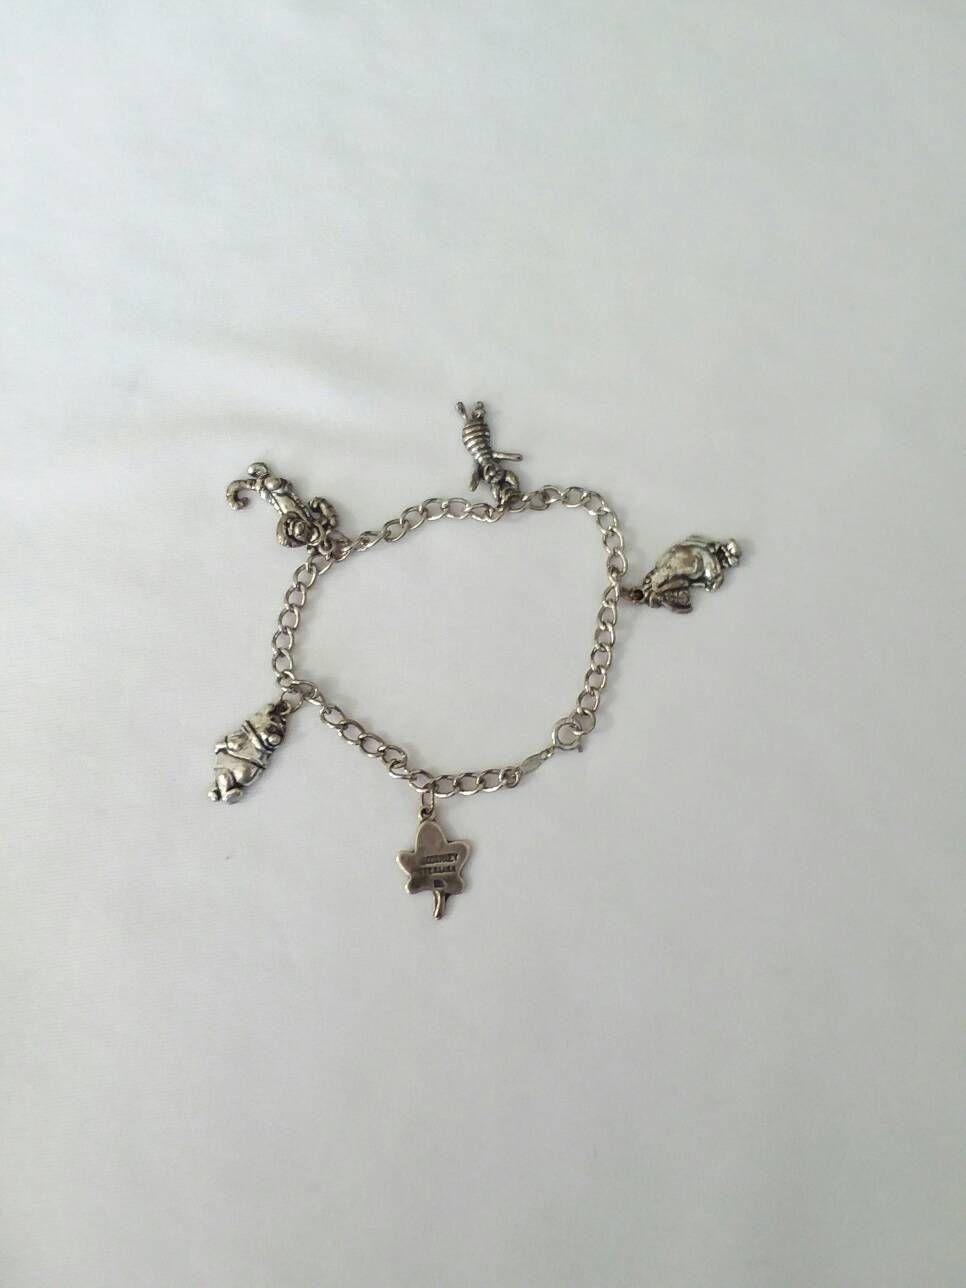 d9470084a78 Vintage Disney Winnie the Pooh Sterling Silver Charm Bracelet